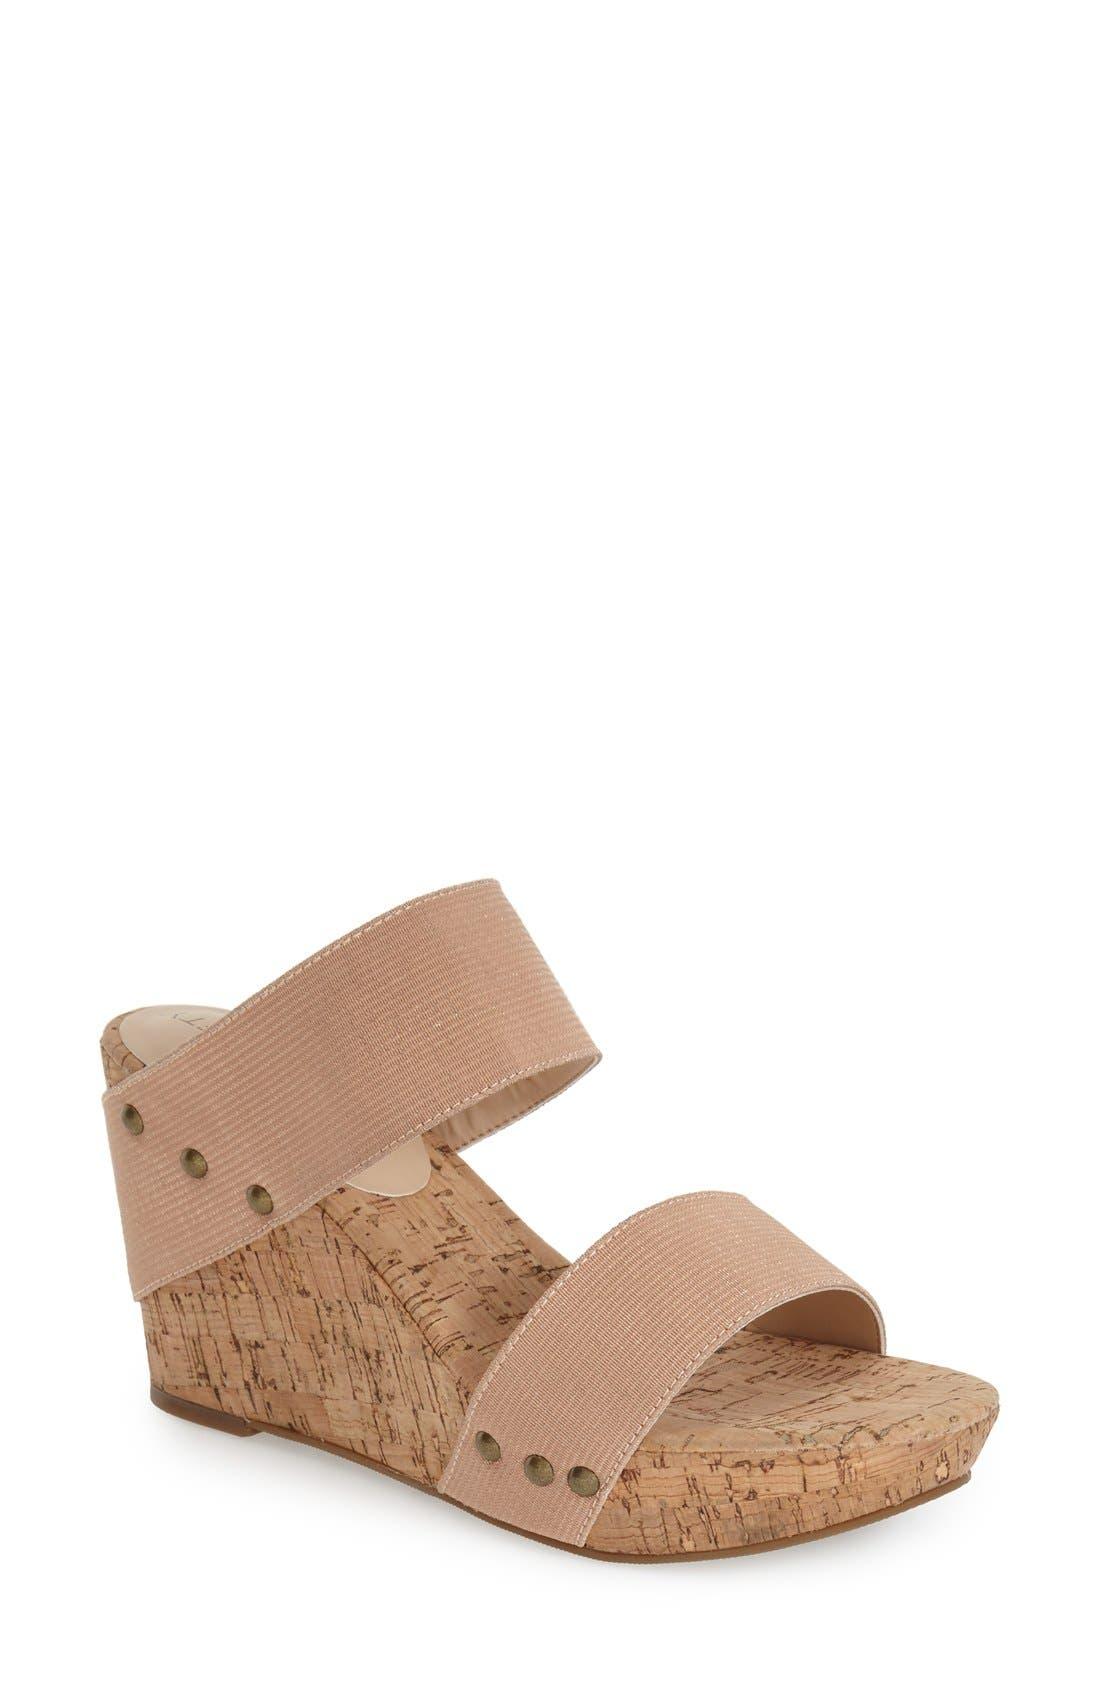 'Emilia 2' Wedge Sandal,                             Main thumbnail 1, color,                             Blush Champagne